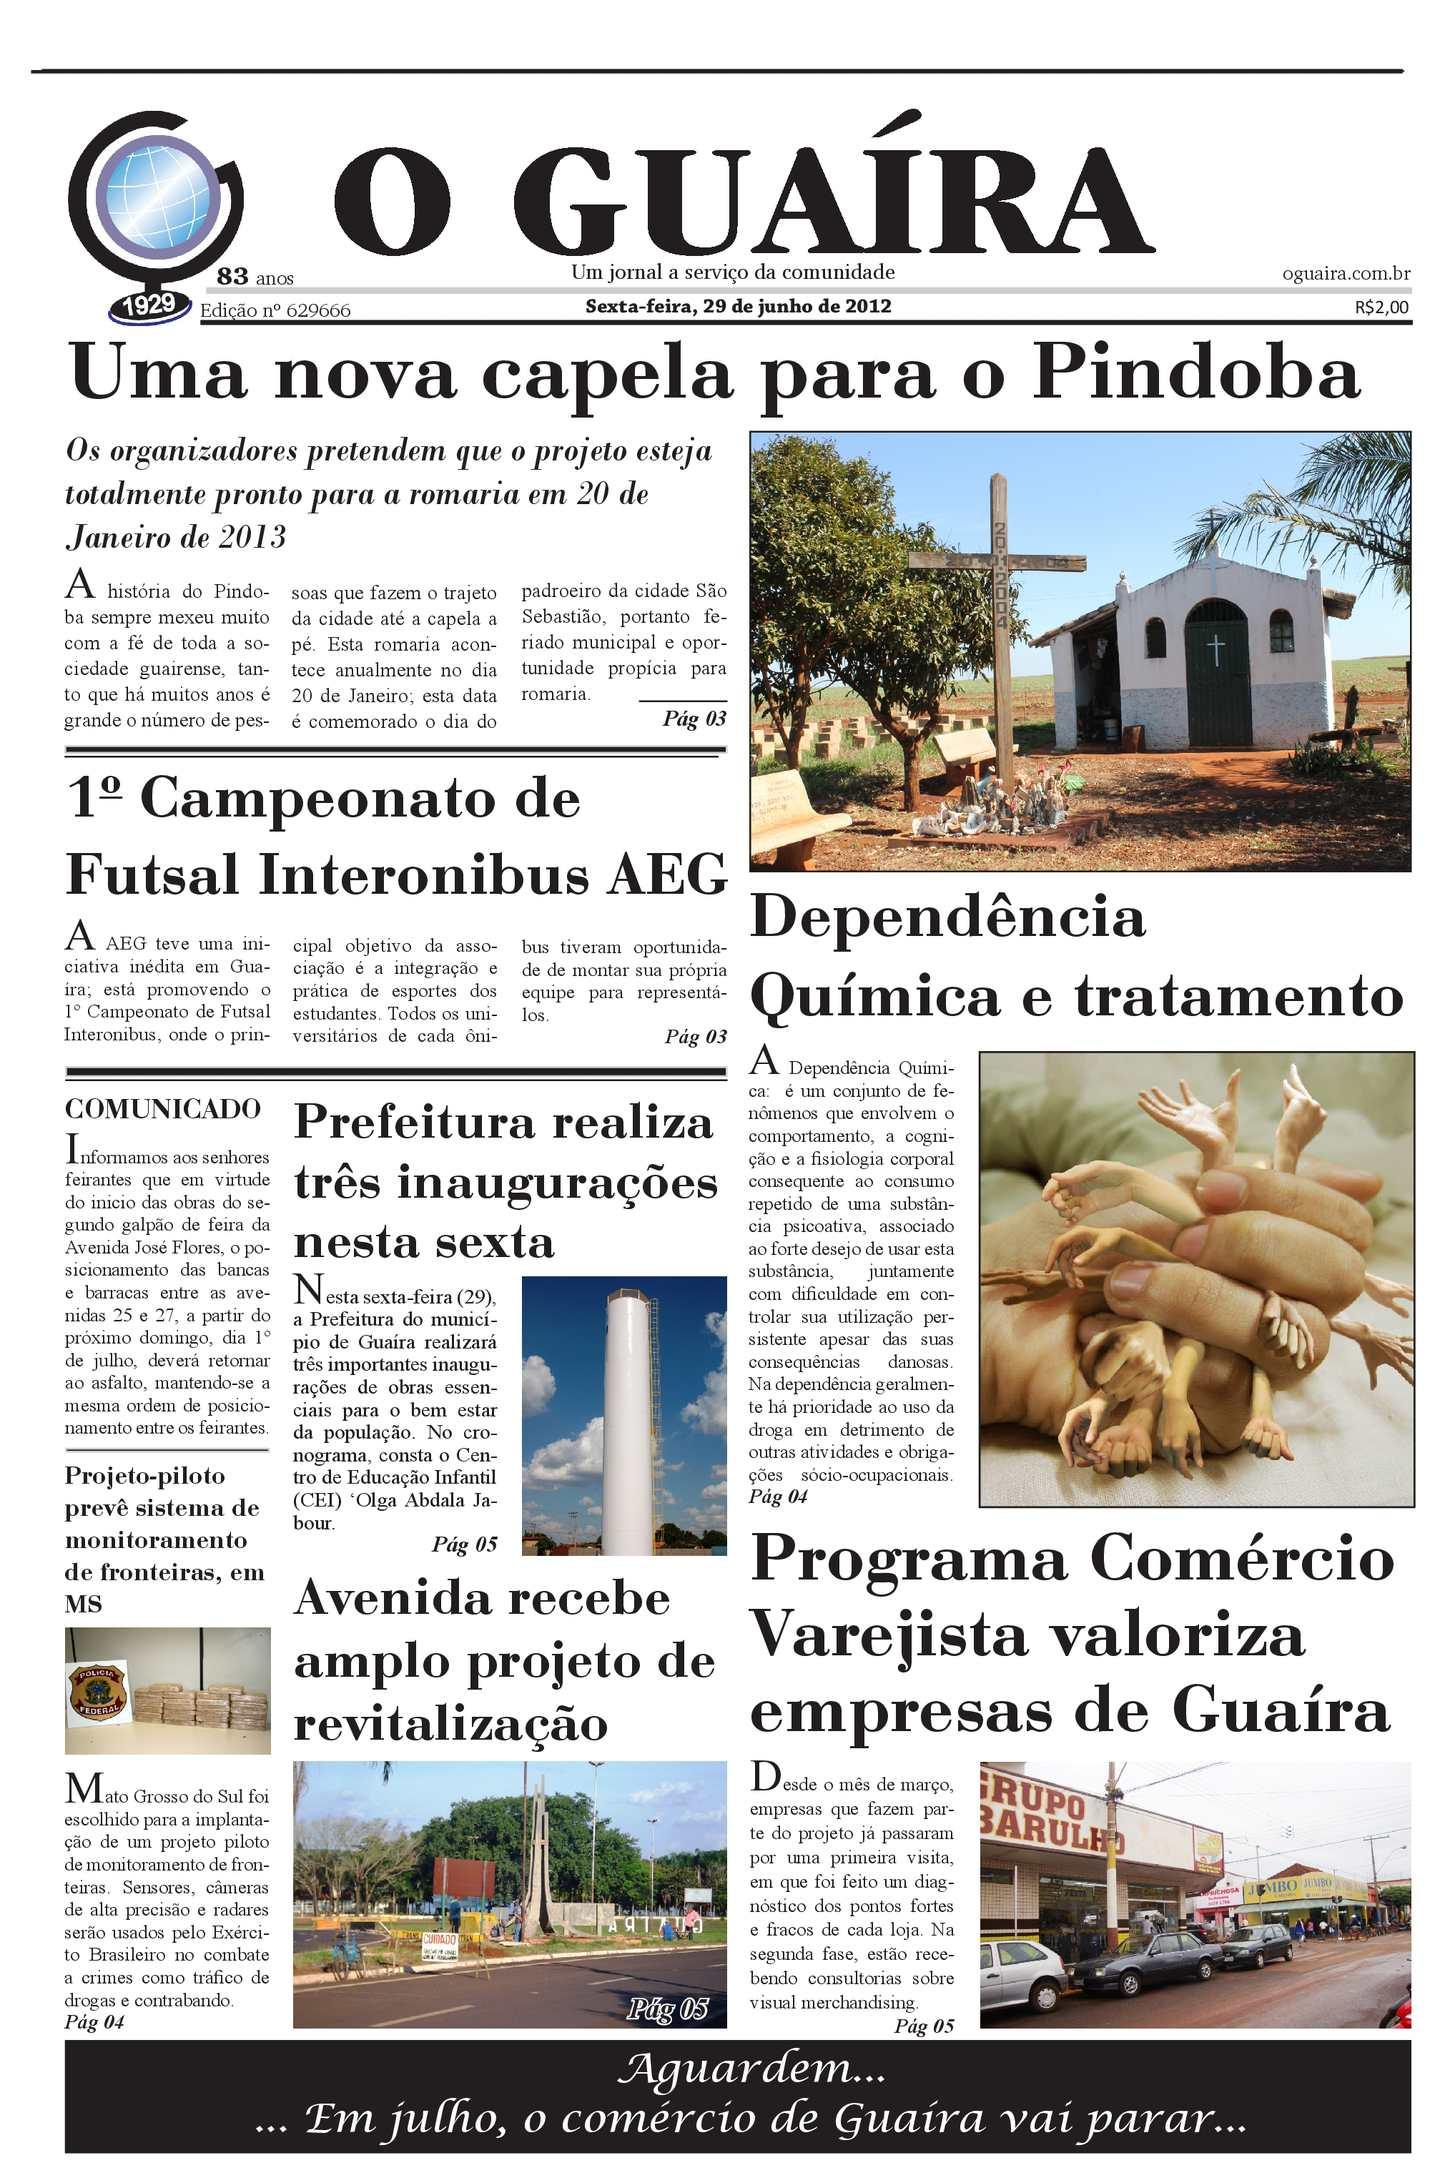 501a4b21c573c Calaméo - jornal o guaira 29 06 2012